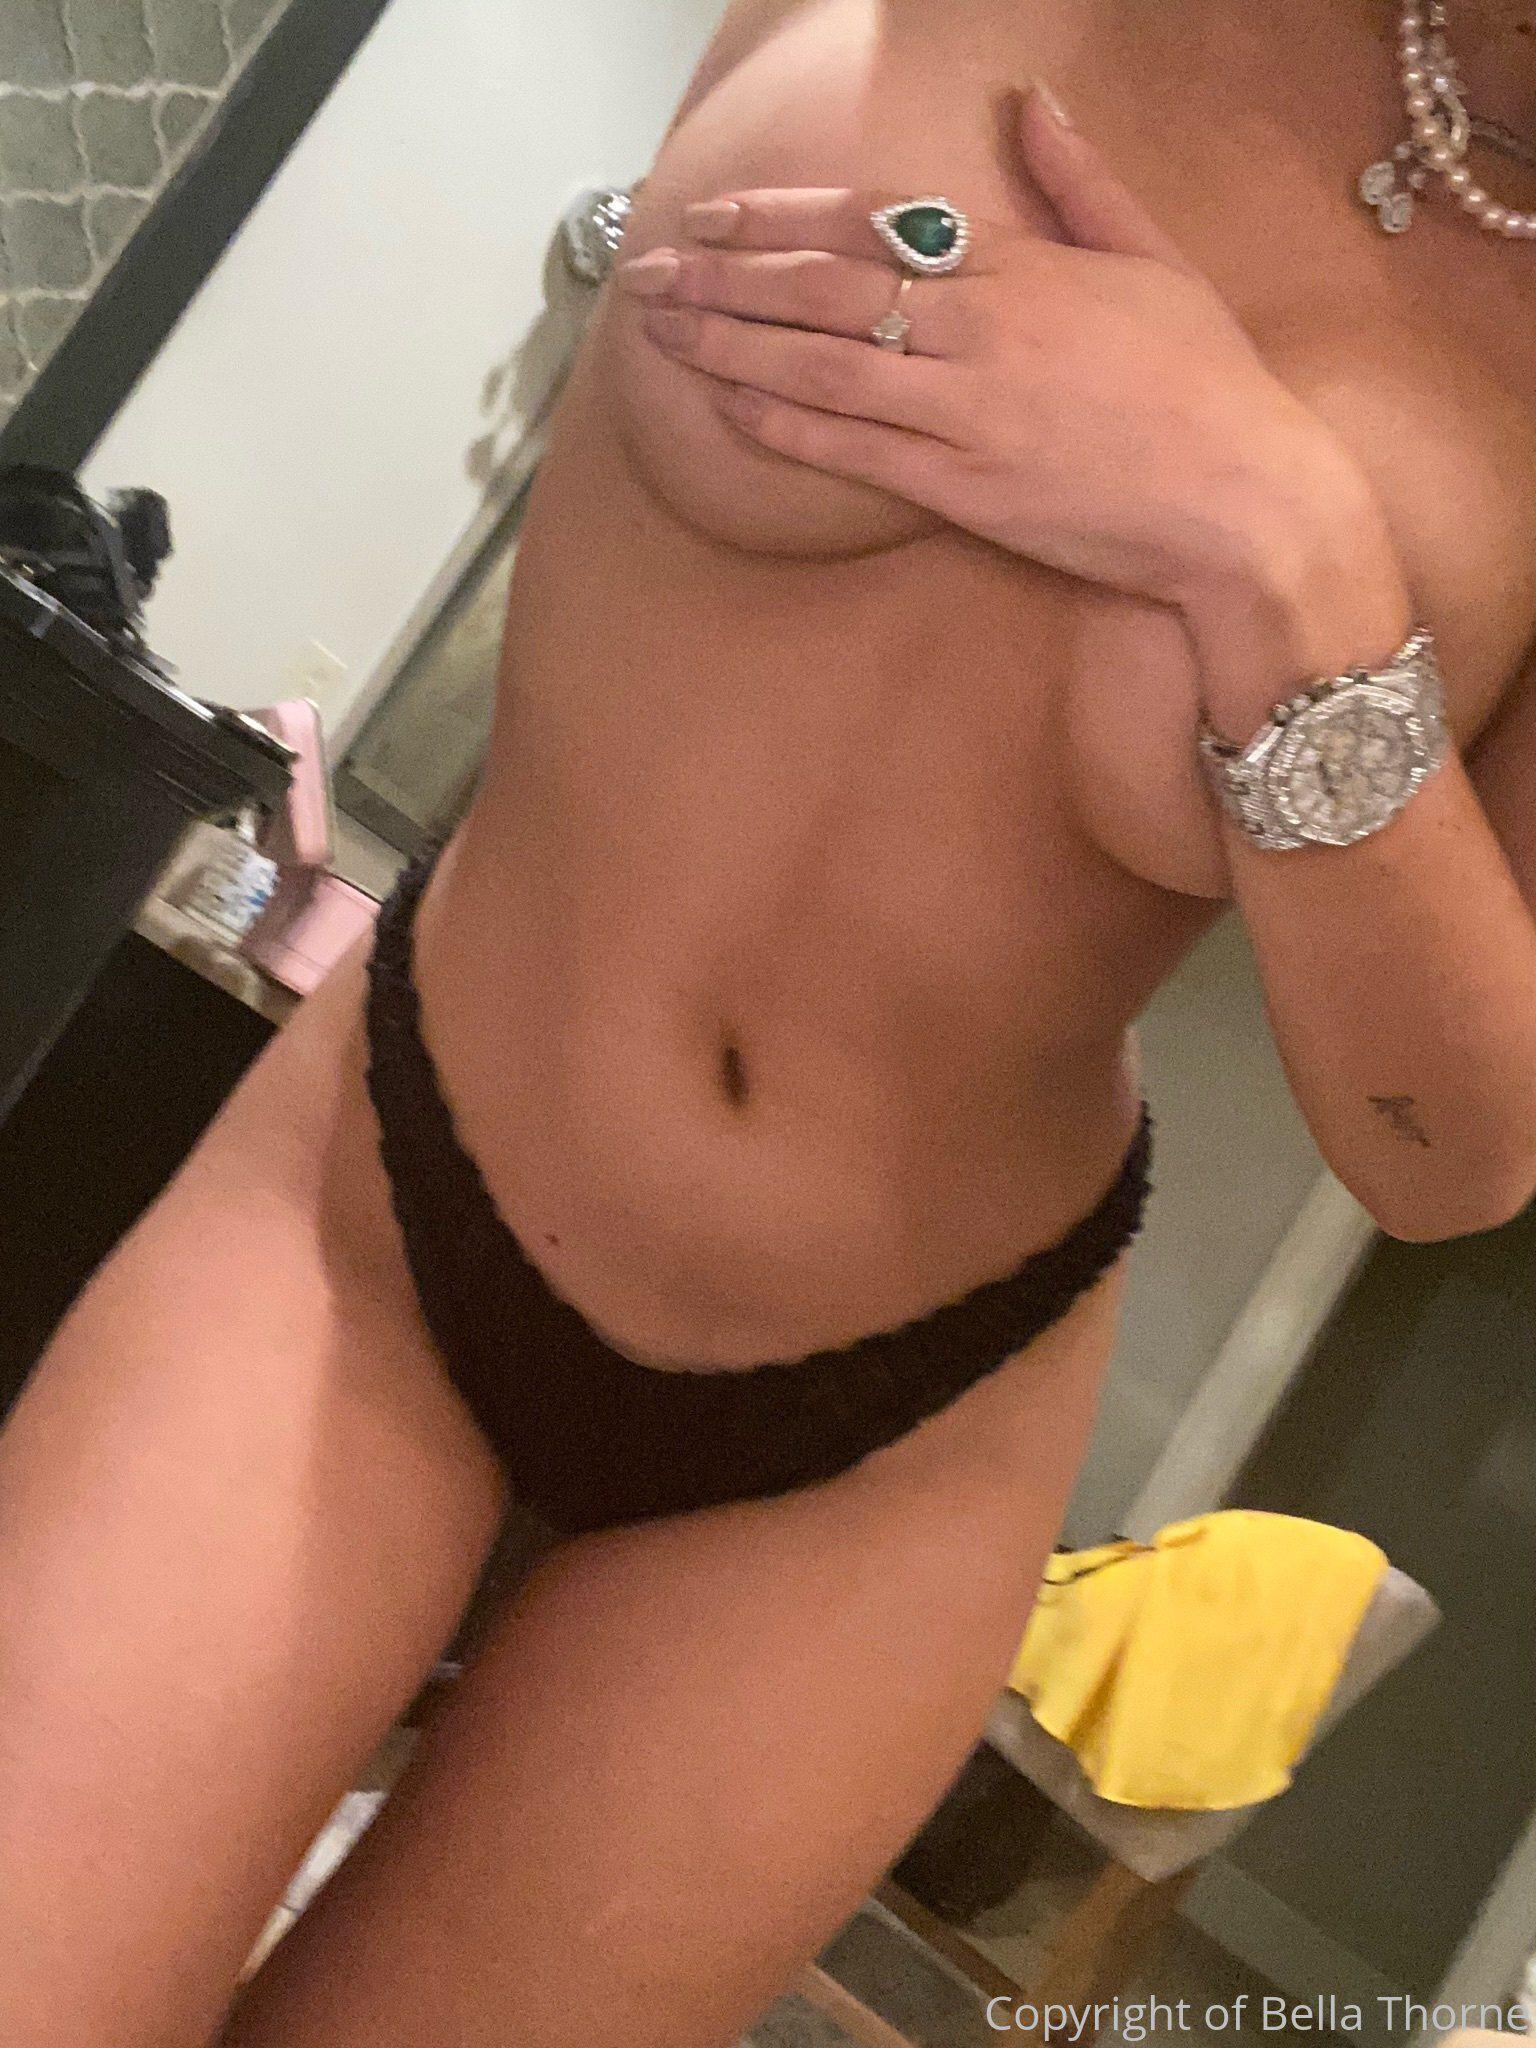 Bella Thorne Topless